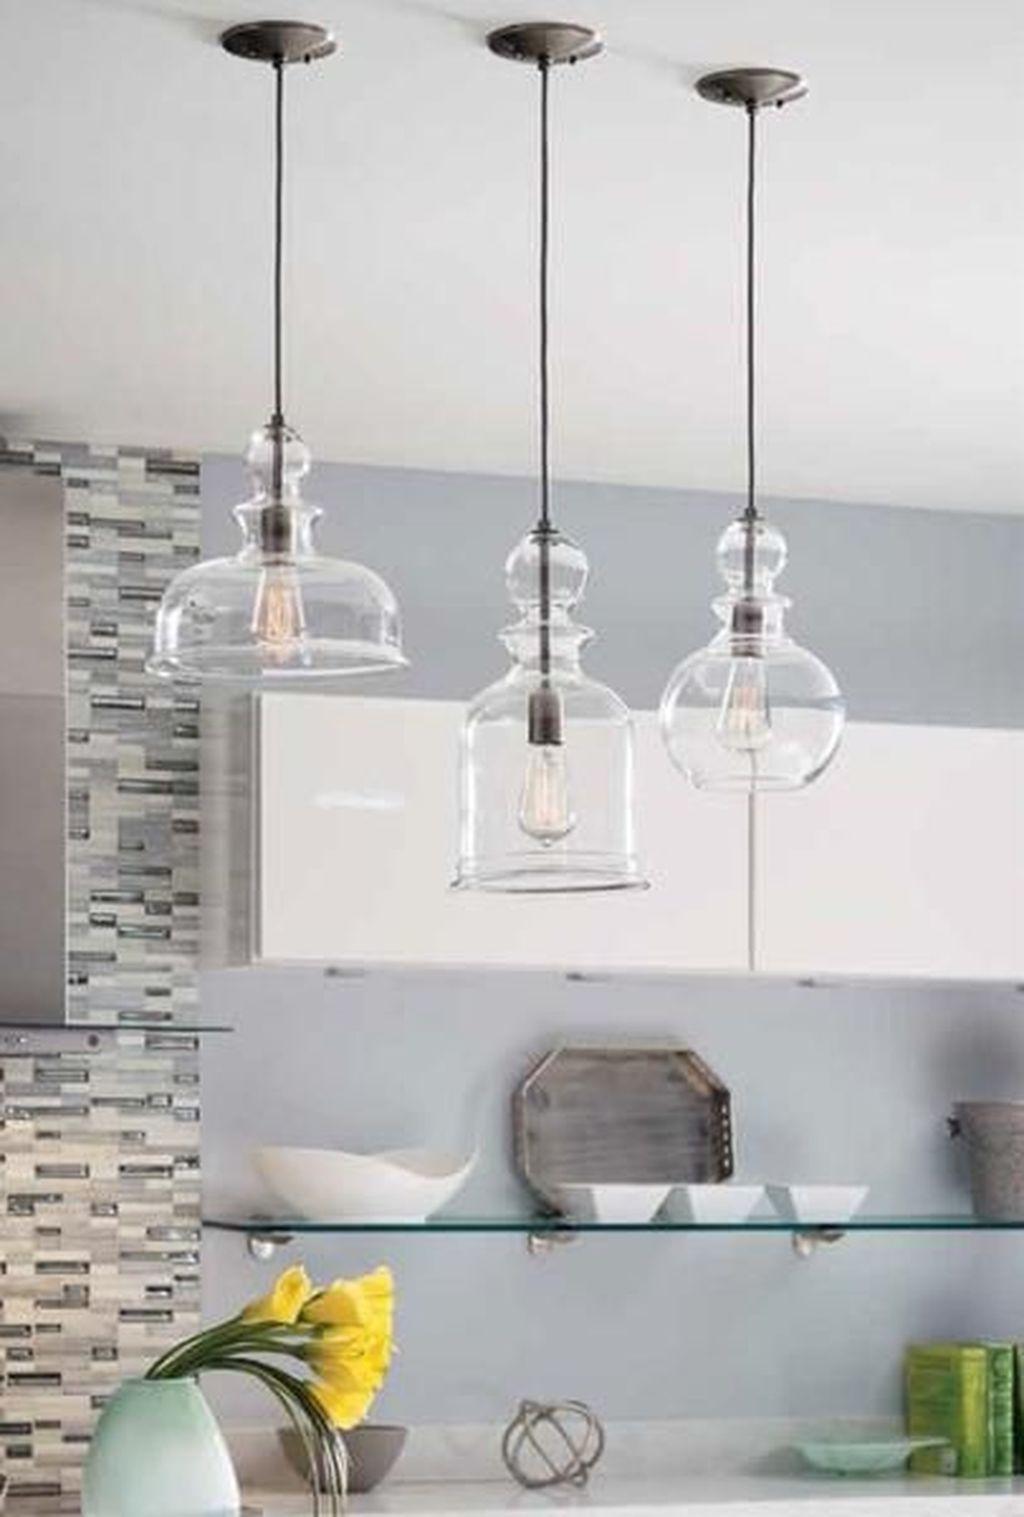 Wonderful Kitchen Lighting Ideas To Make It Look More Beautiful 23